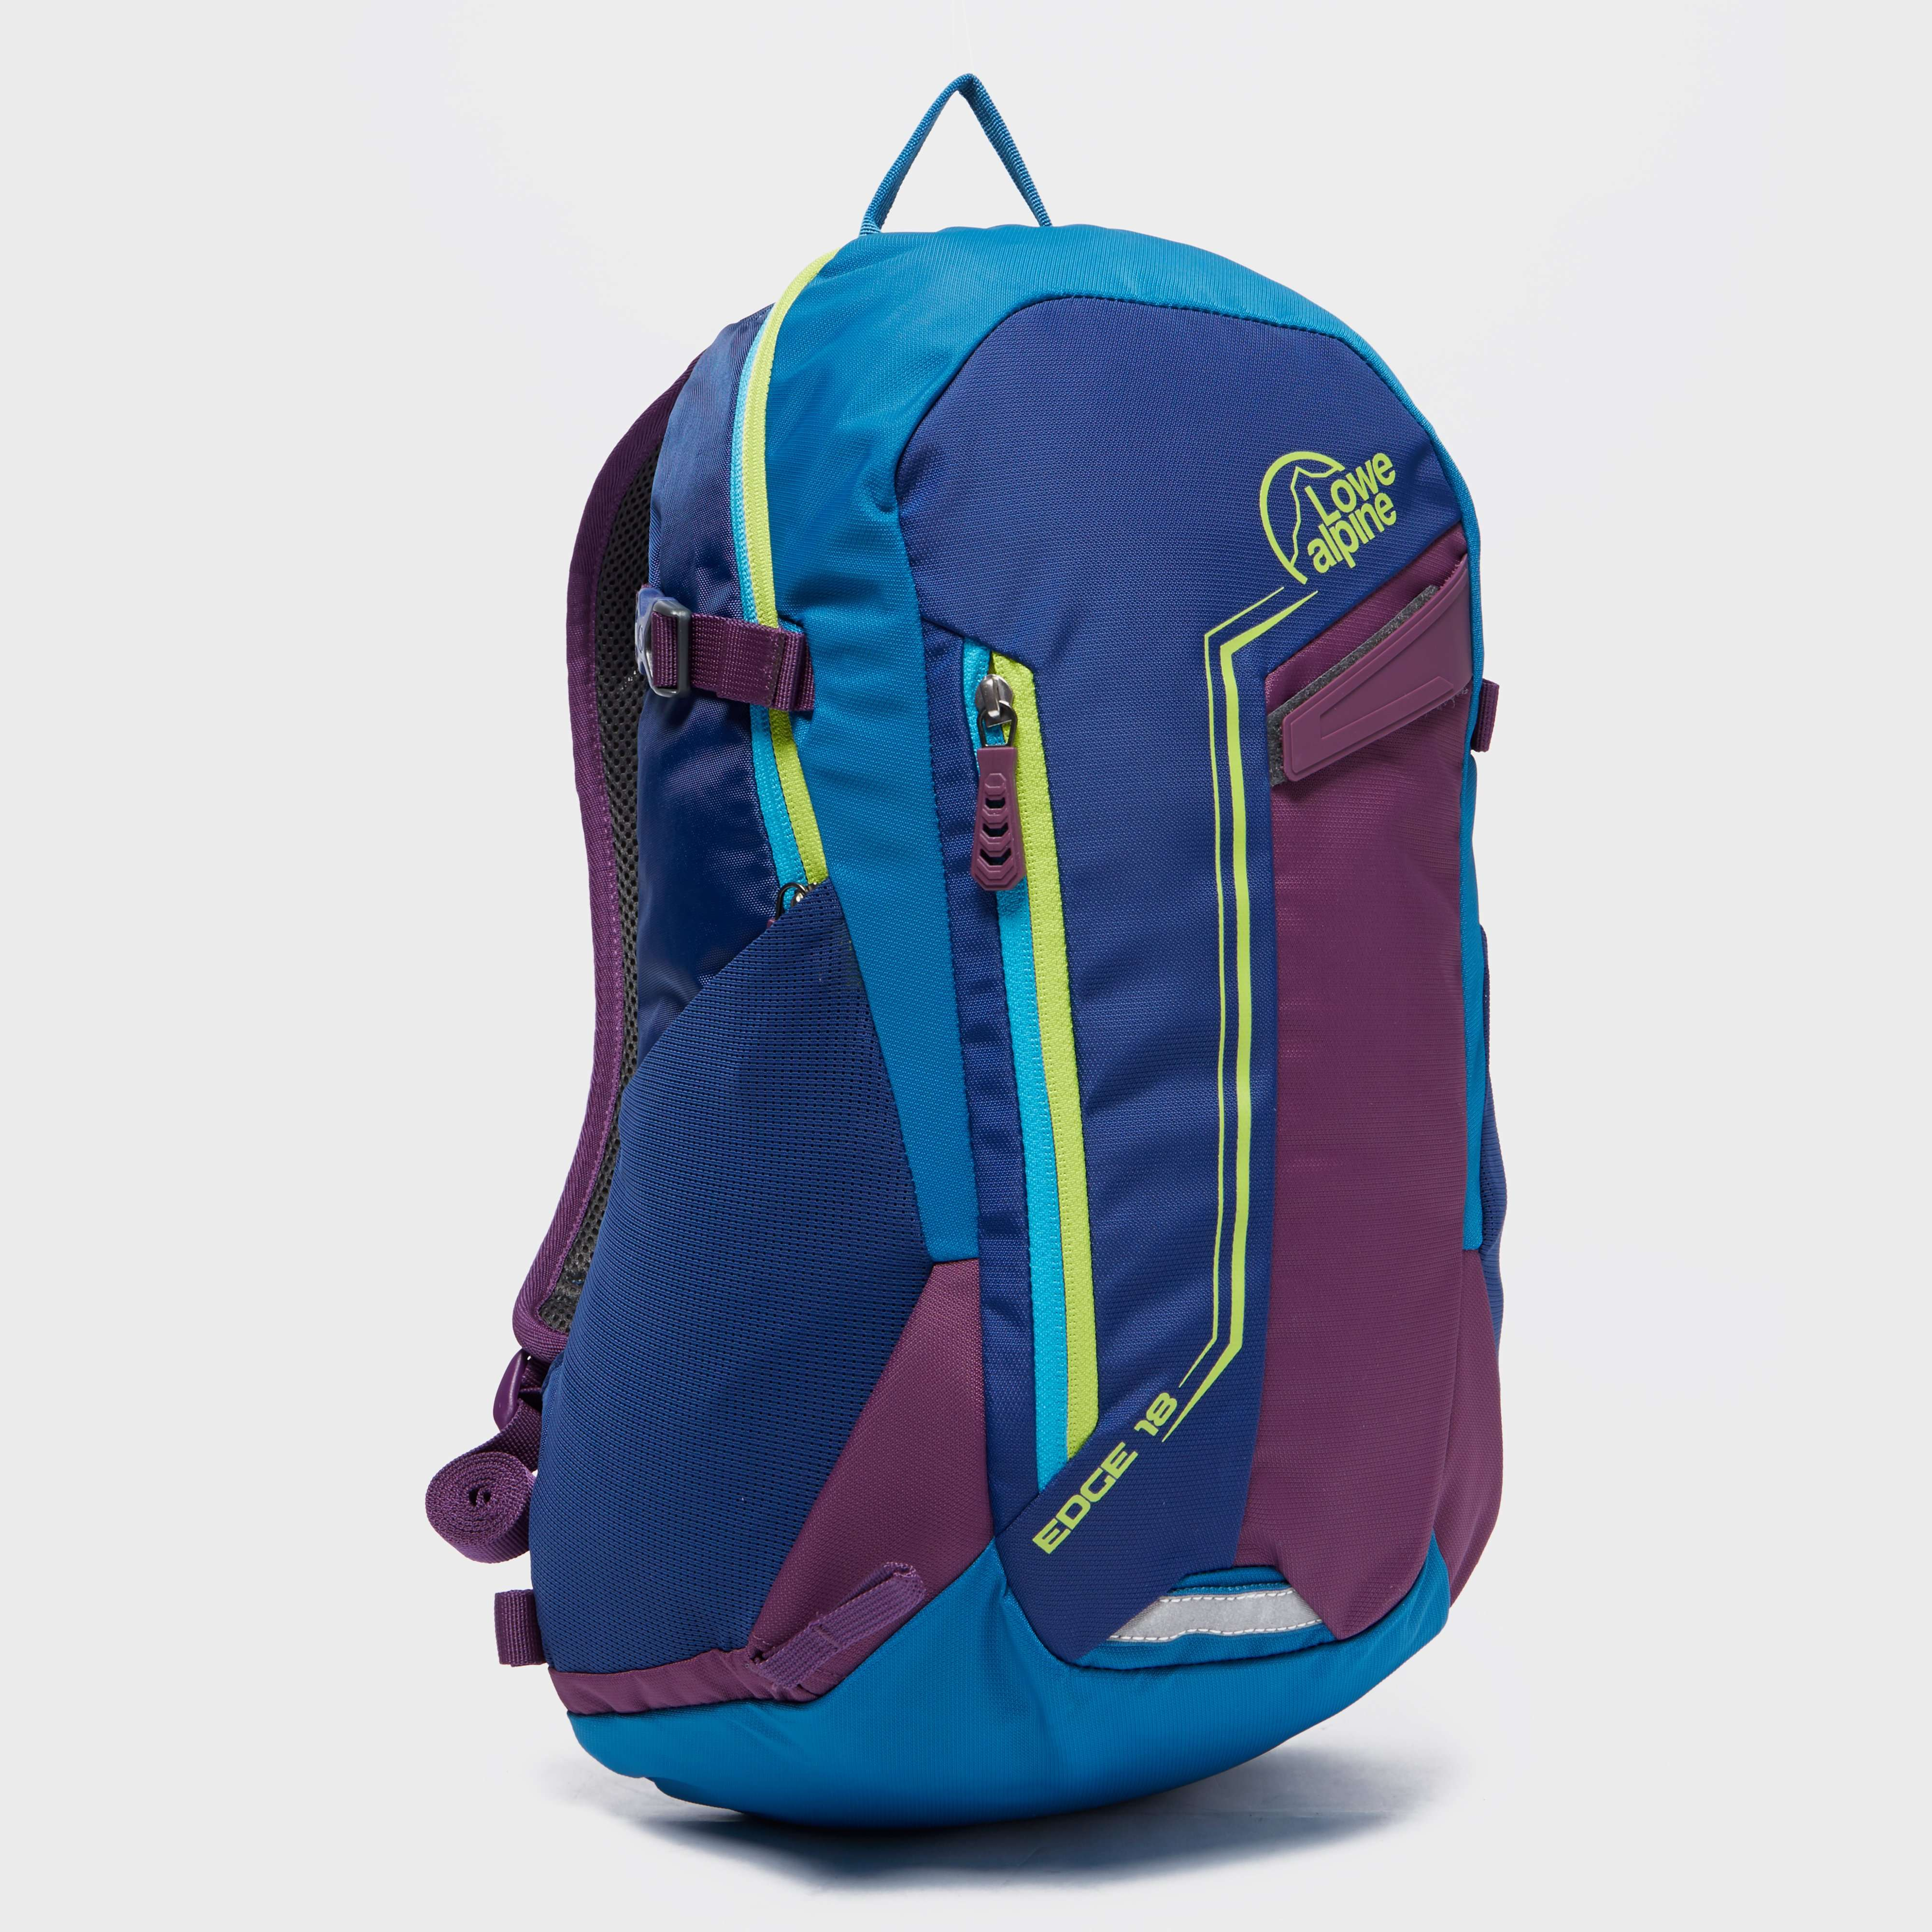 LOWE ALPINE Edge II 18 Daypack